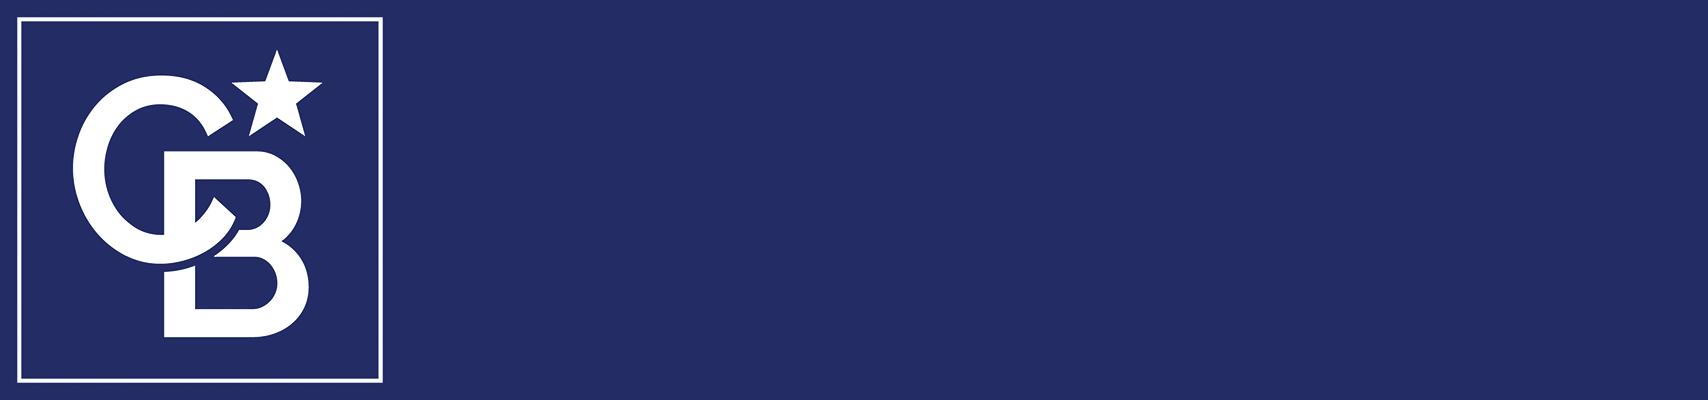 Steve Keefe - Coldwell Banker Sky Ridge Realty Logo